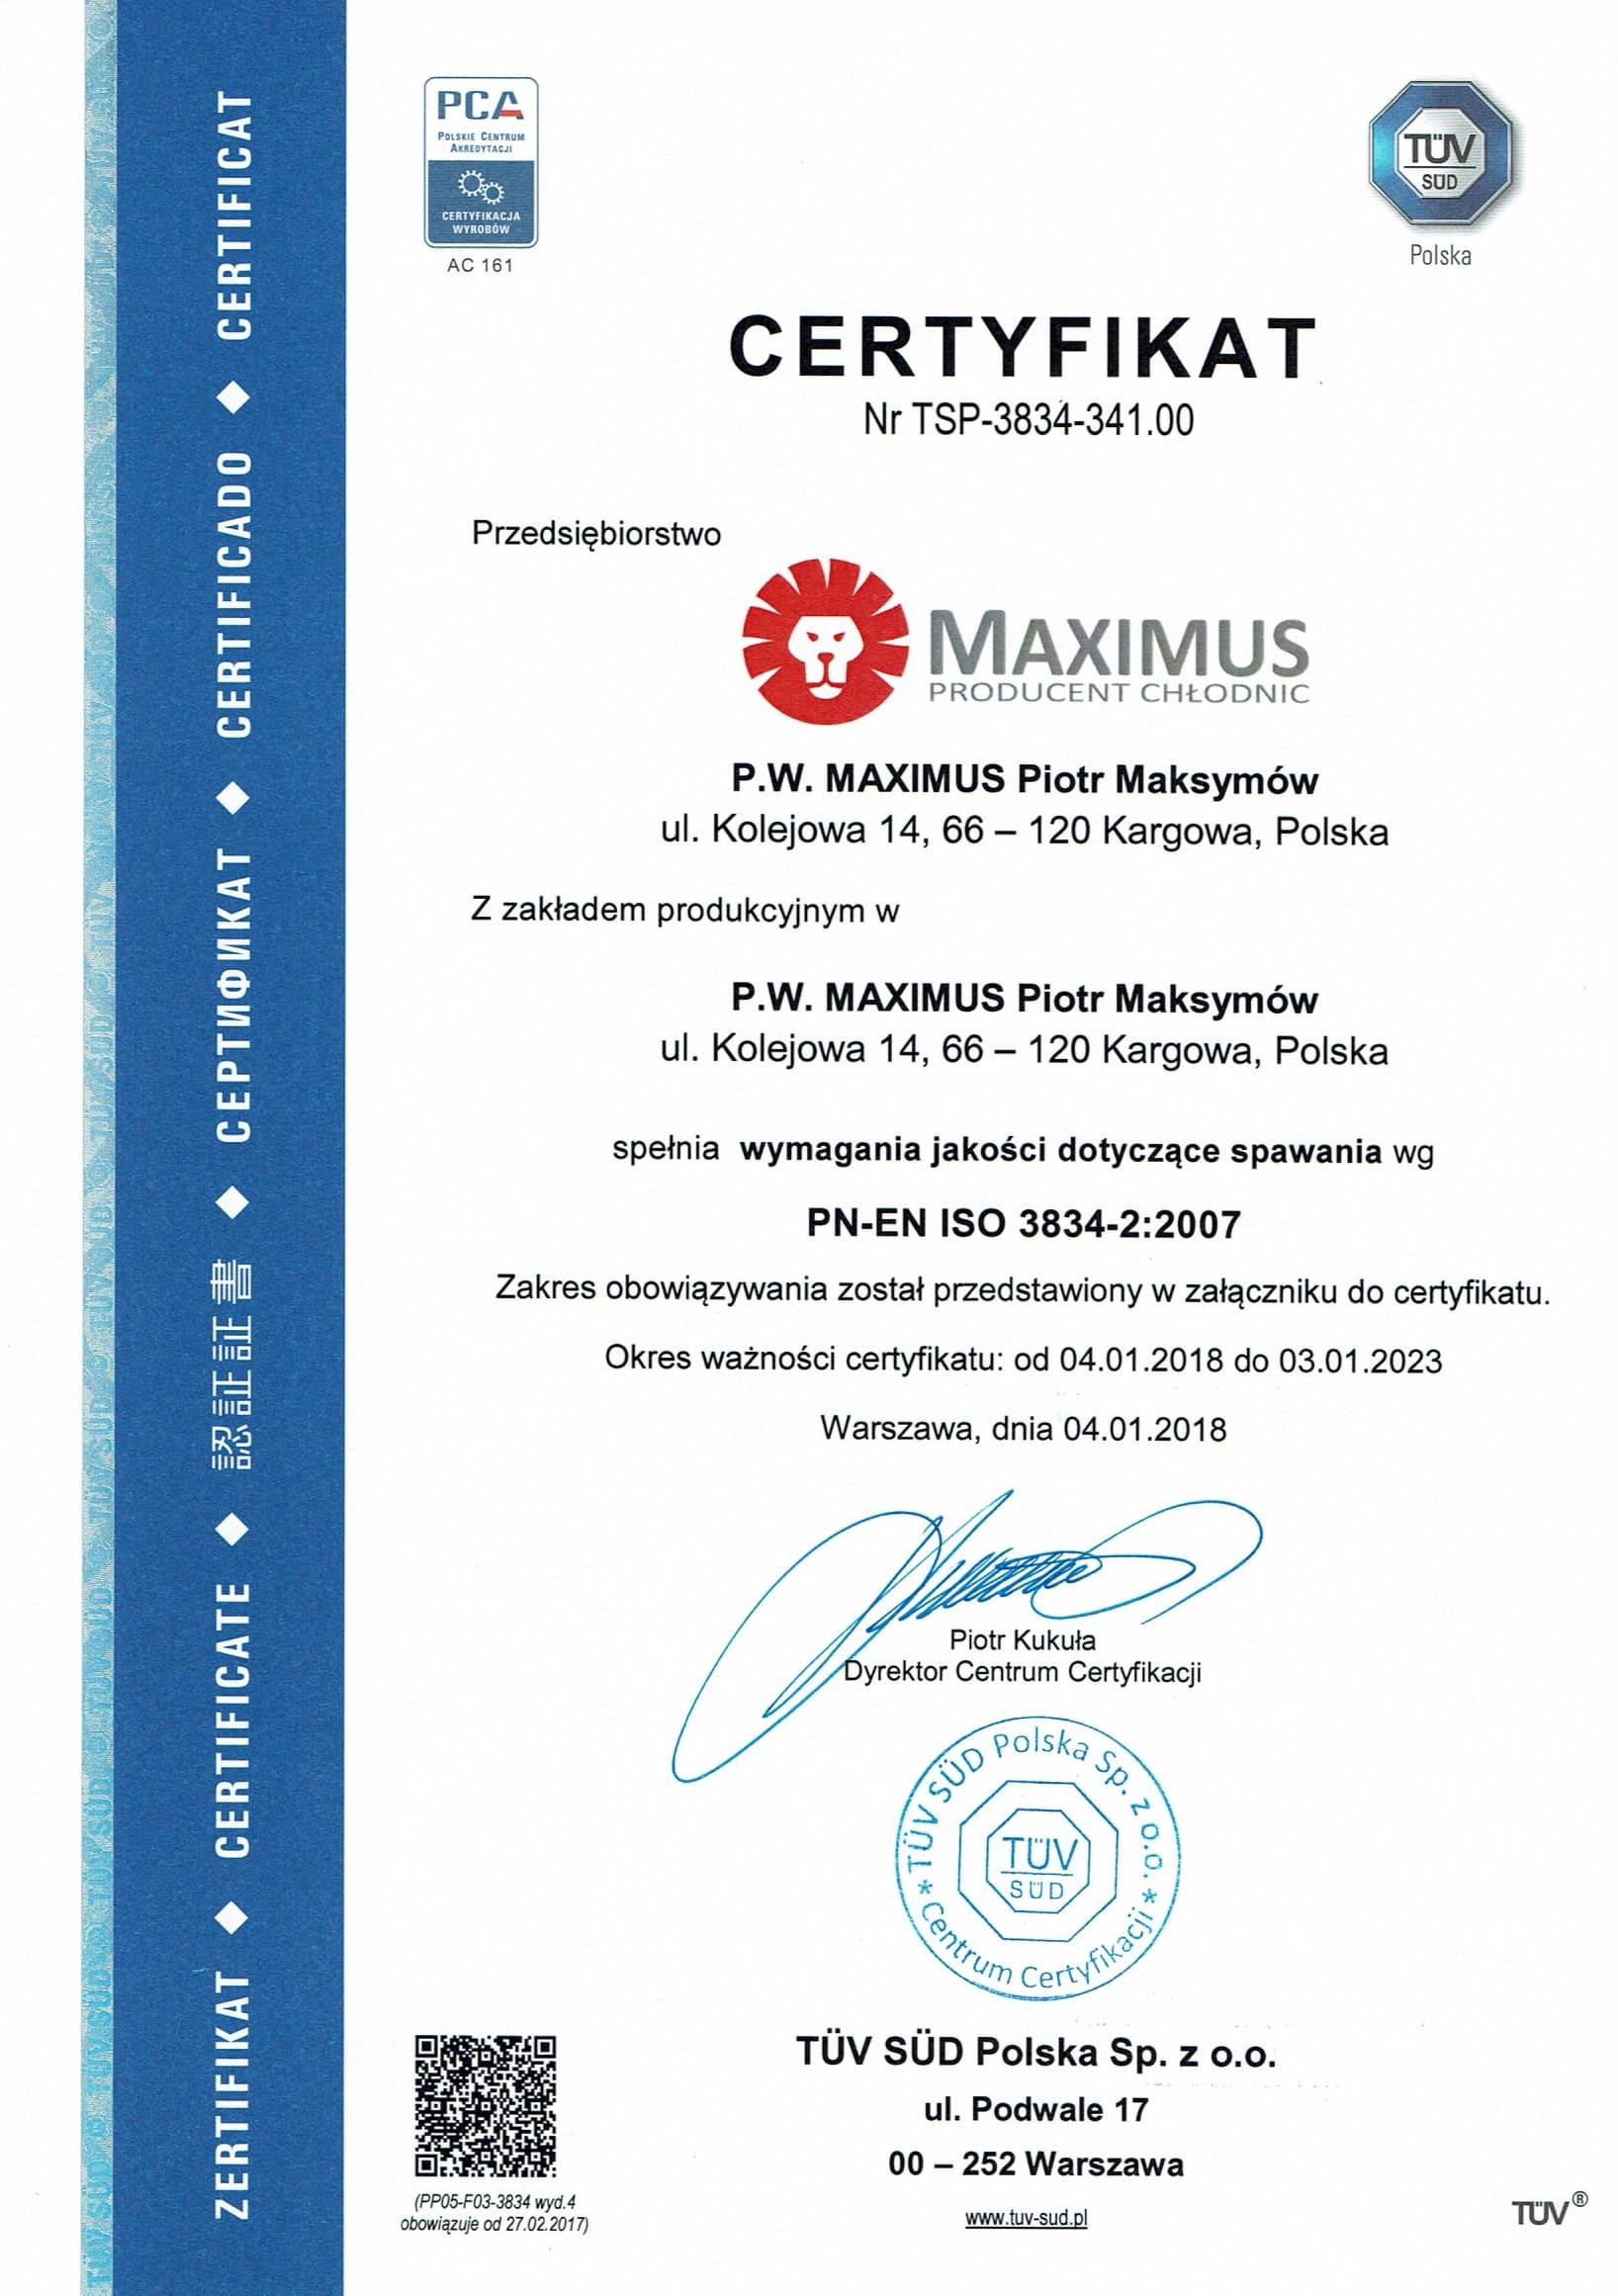 certyfikat polski 3834 1 2